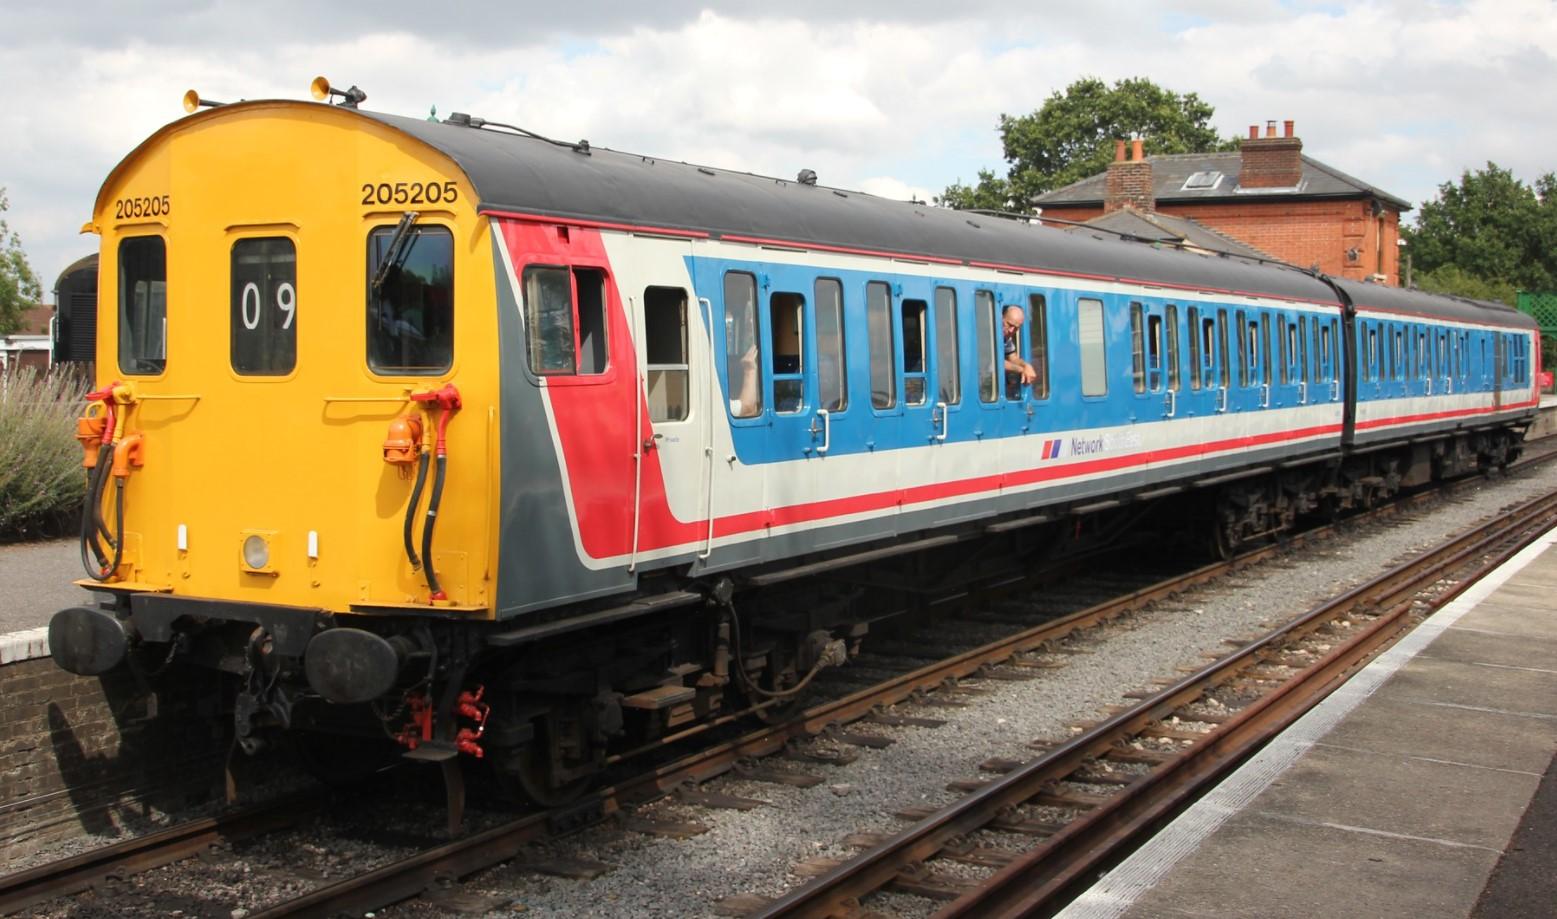 205205 on the Mid Hants Railway in August 2014. ©Matthew Black